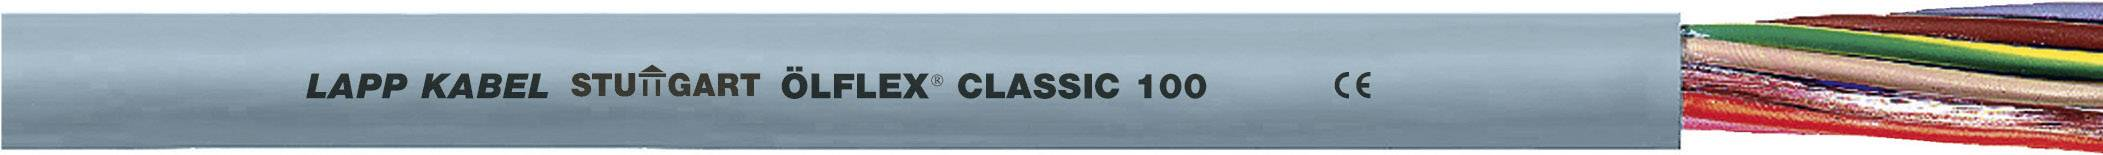 Kabel LappKabel Ölflex CLASSIC 100 15G0,75 (0010031), PVC, 10,9 mm, 500 V, šedá, 100 m